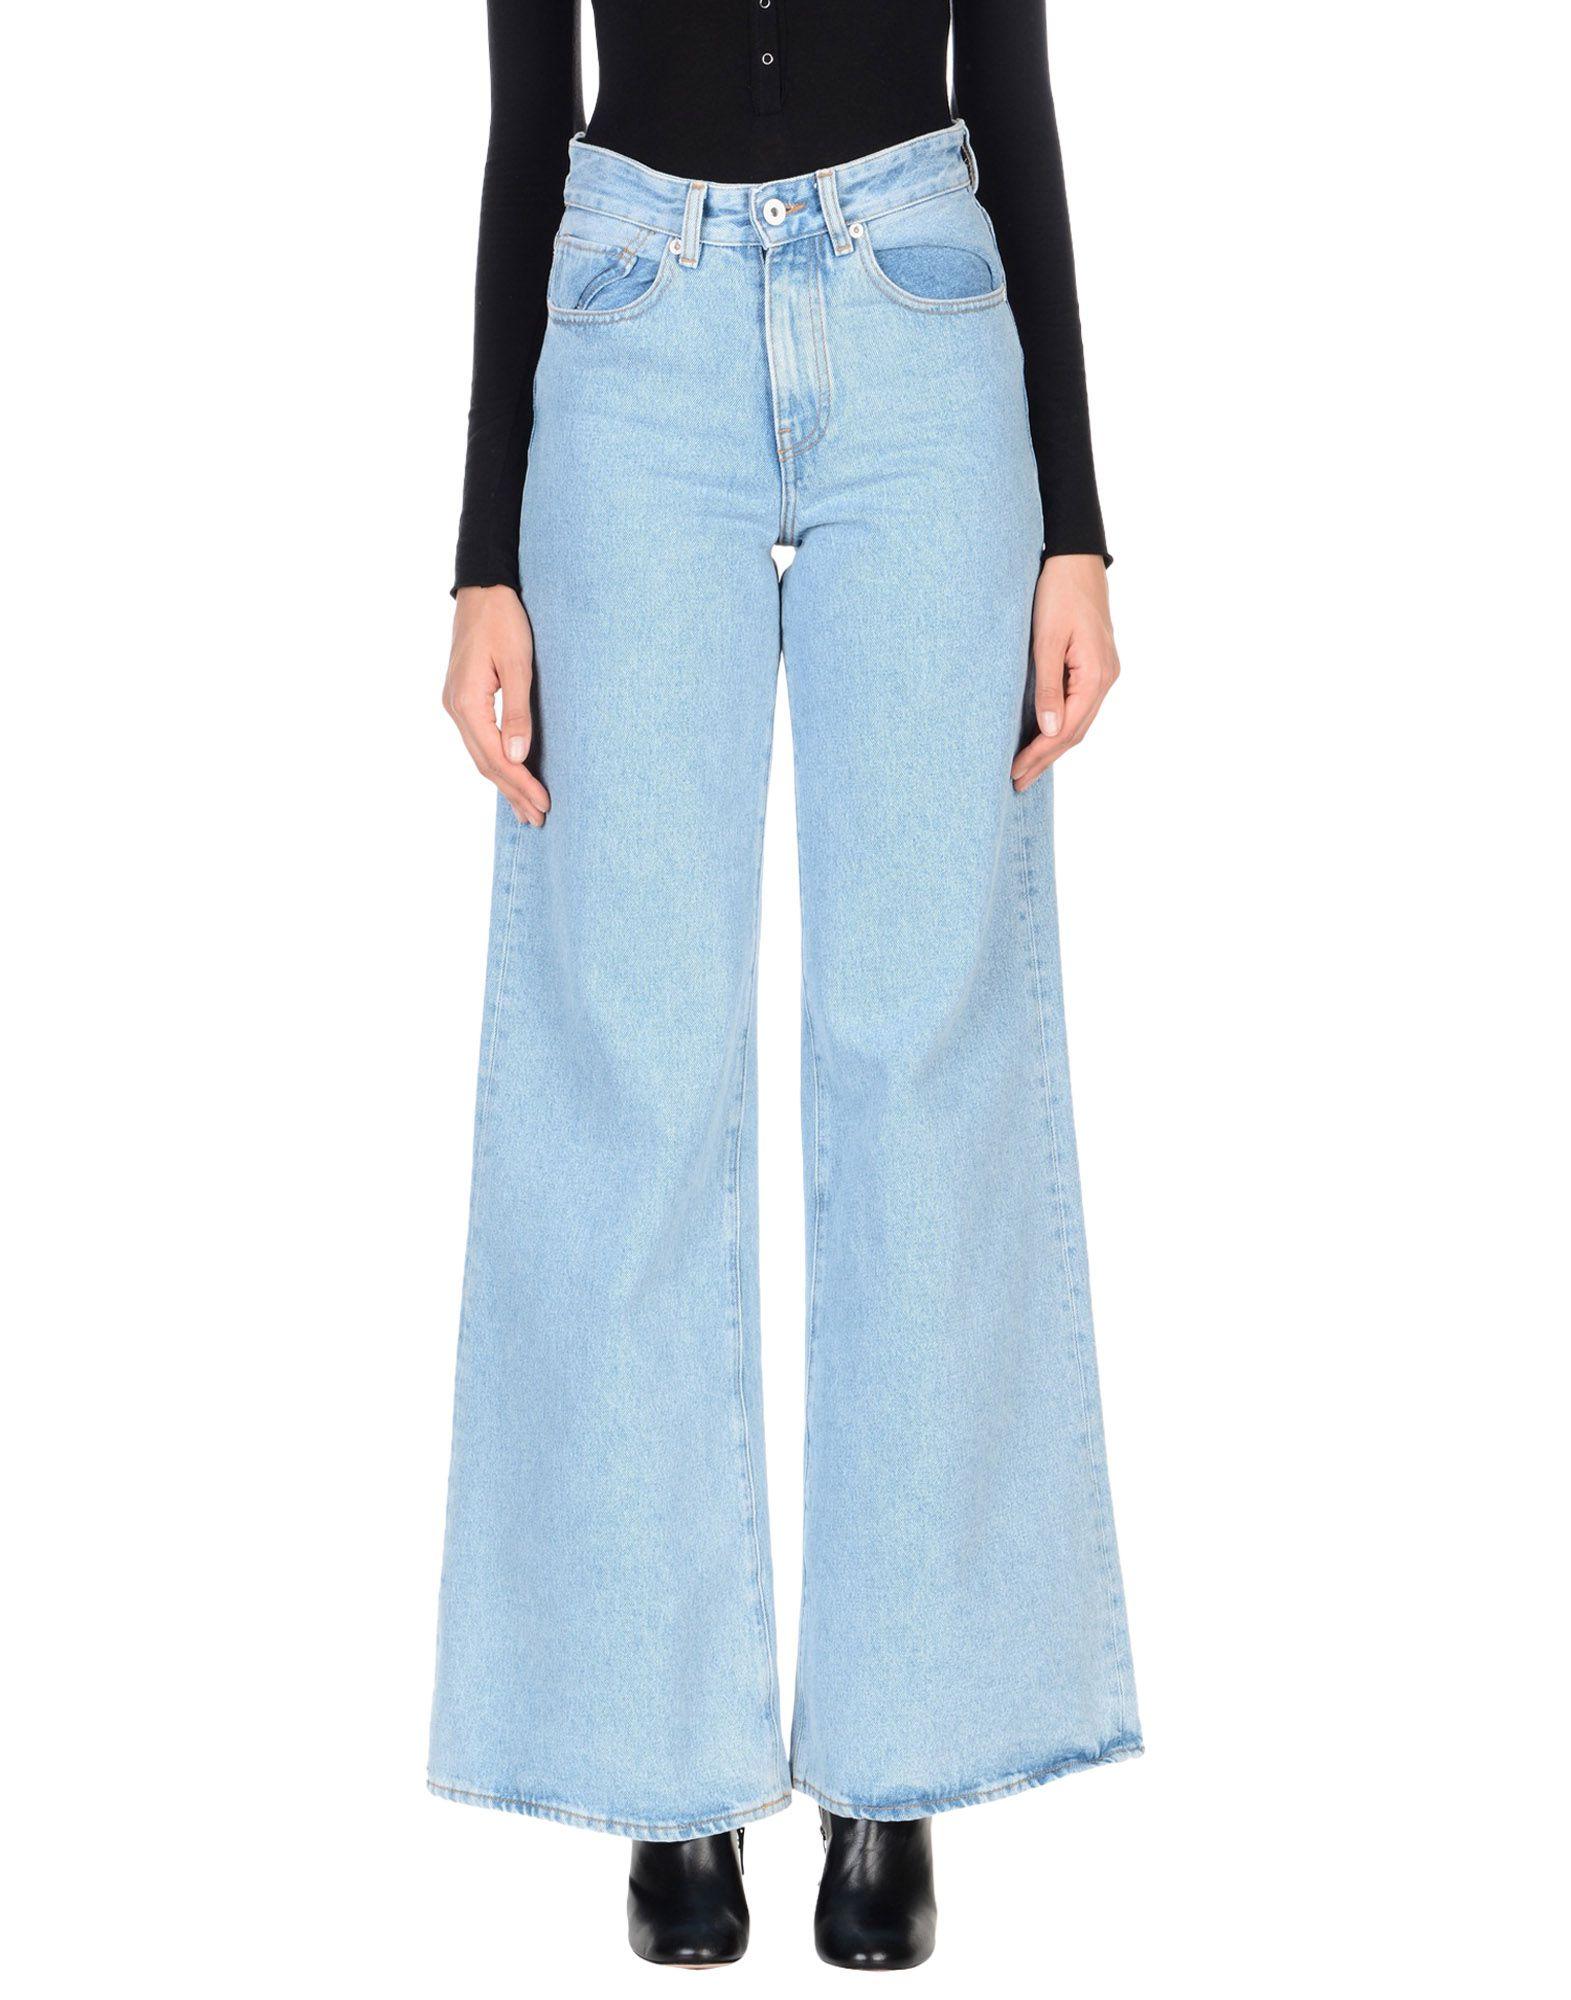 Pantaloni Jeans Off-White™ Donna - Acquista online su oddJQoLM8